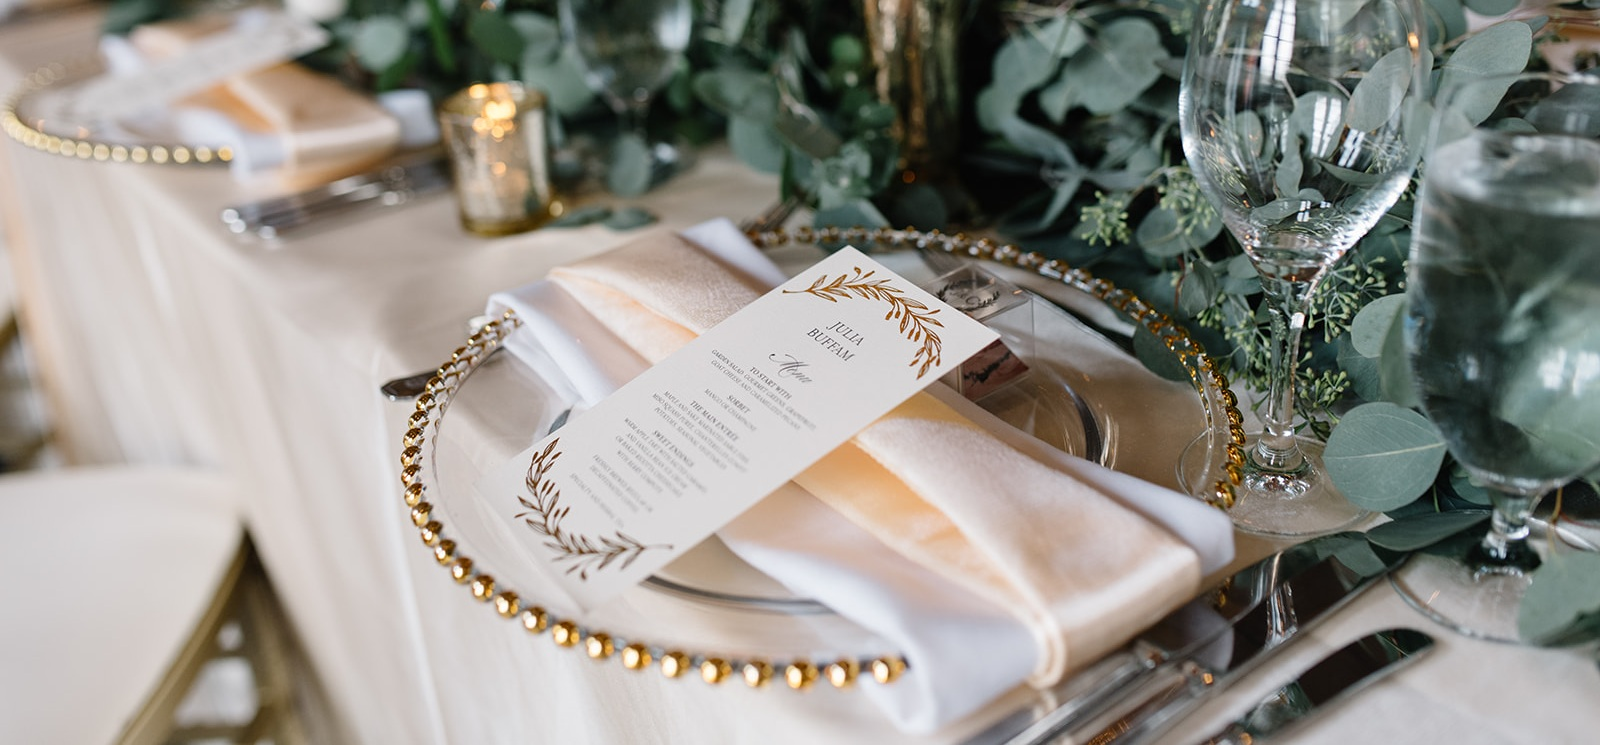 Sandra+Bettina+Weddings+Edmonton+and+St.jpg